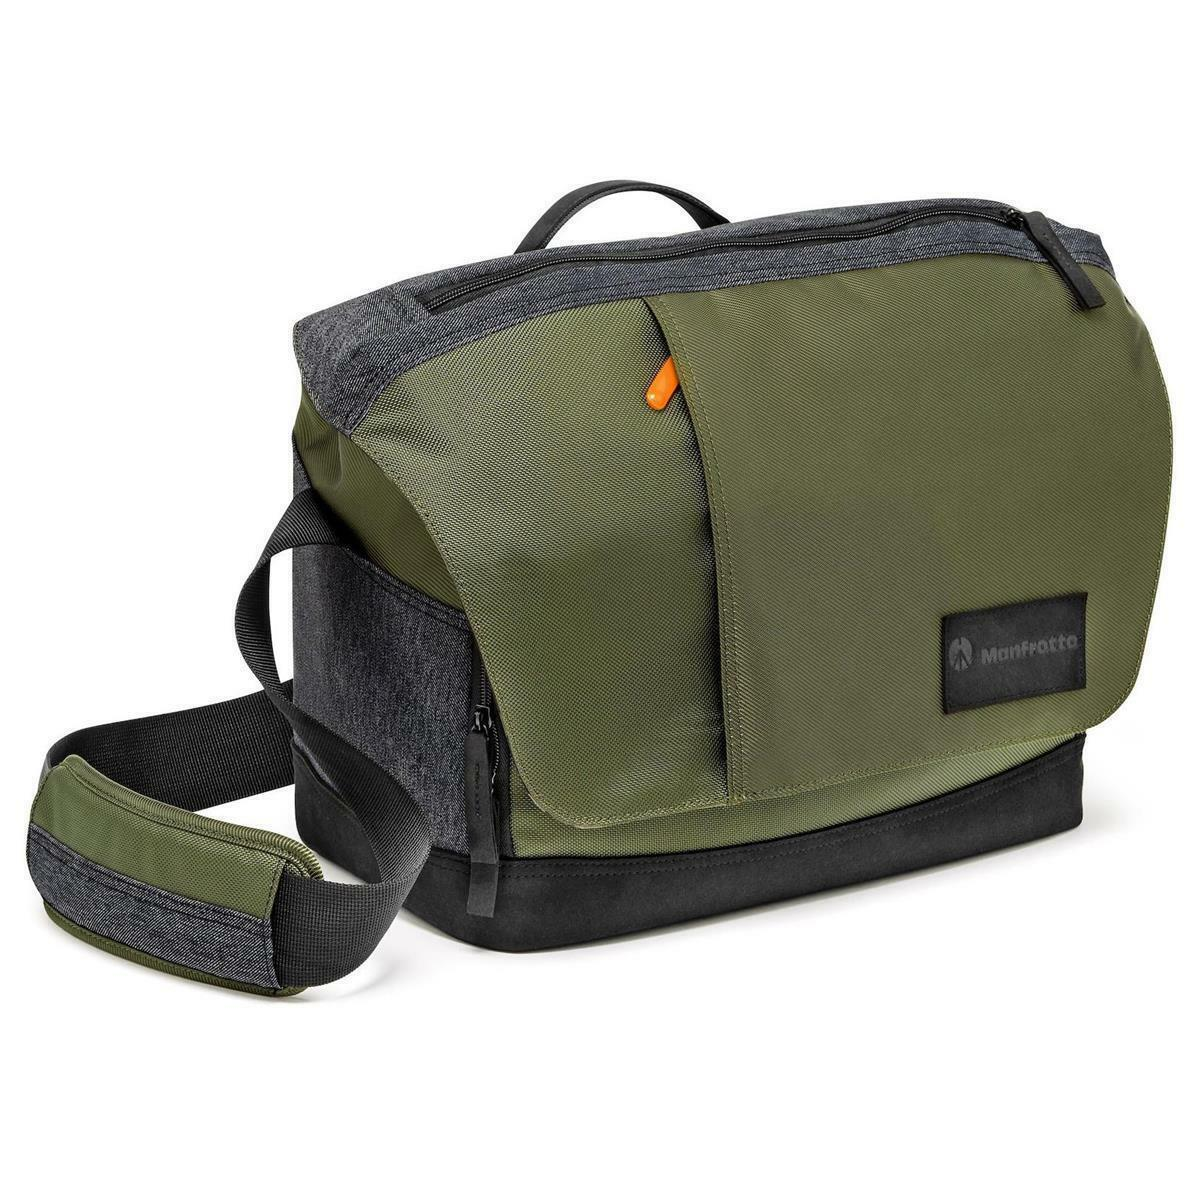 Manfrotto Street Large Messenger Bag for DSLR/CSC Cameras, S